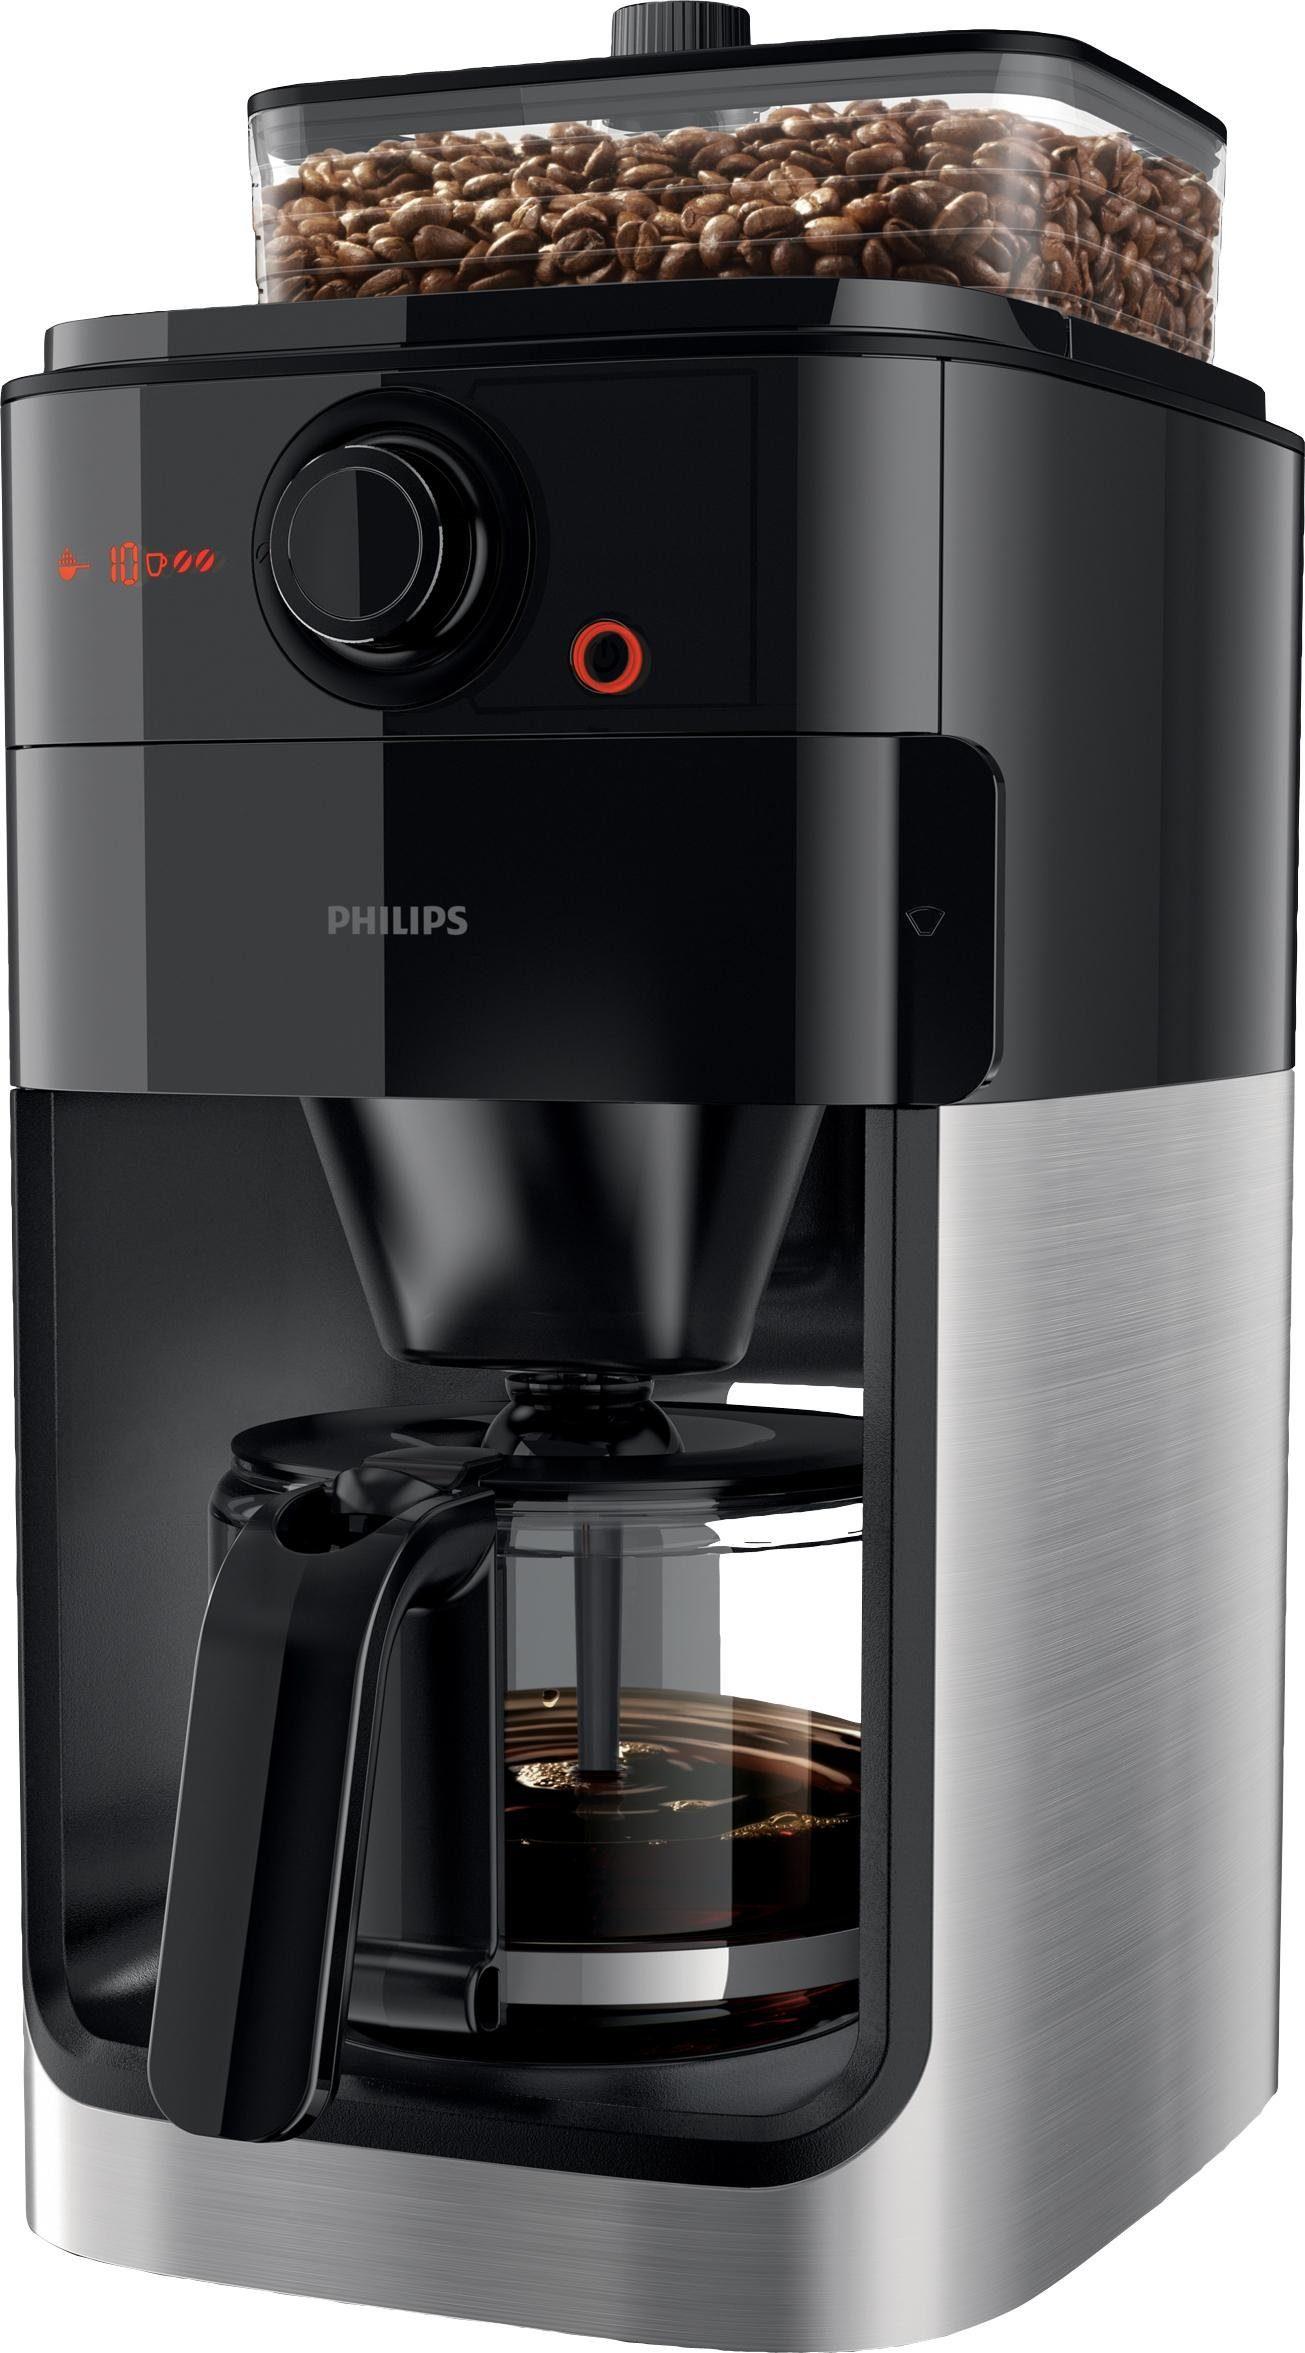 Philips Kaffeemaschine mit Mahlwerk HD7765/00 Grind & Brew, 1,2l Kaffeekanne, Papierfilter 1x4, Mahlwerk wahlweise abschaltbar